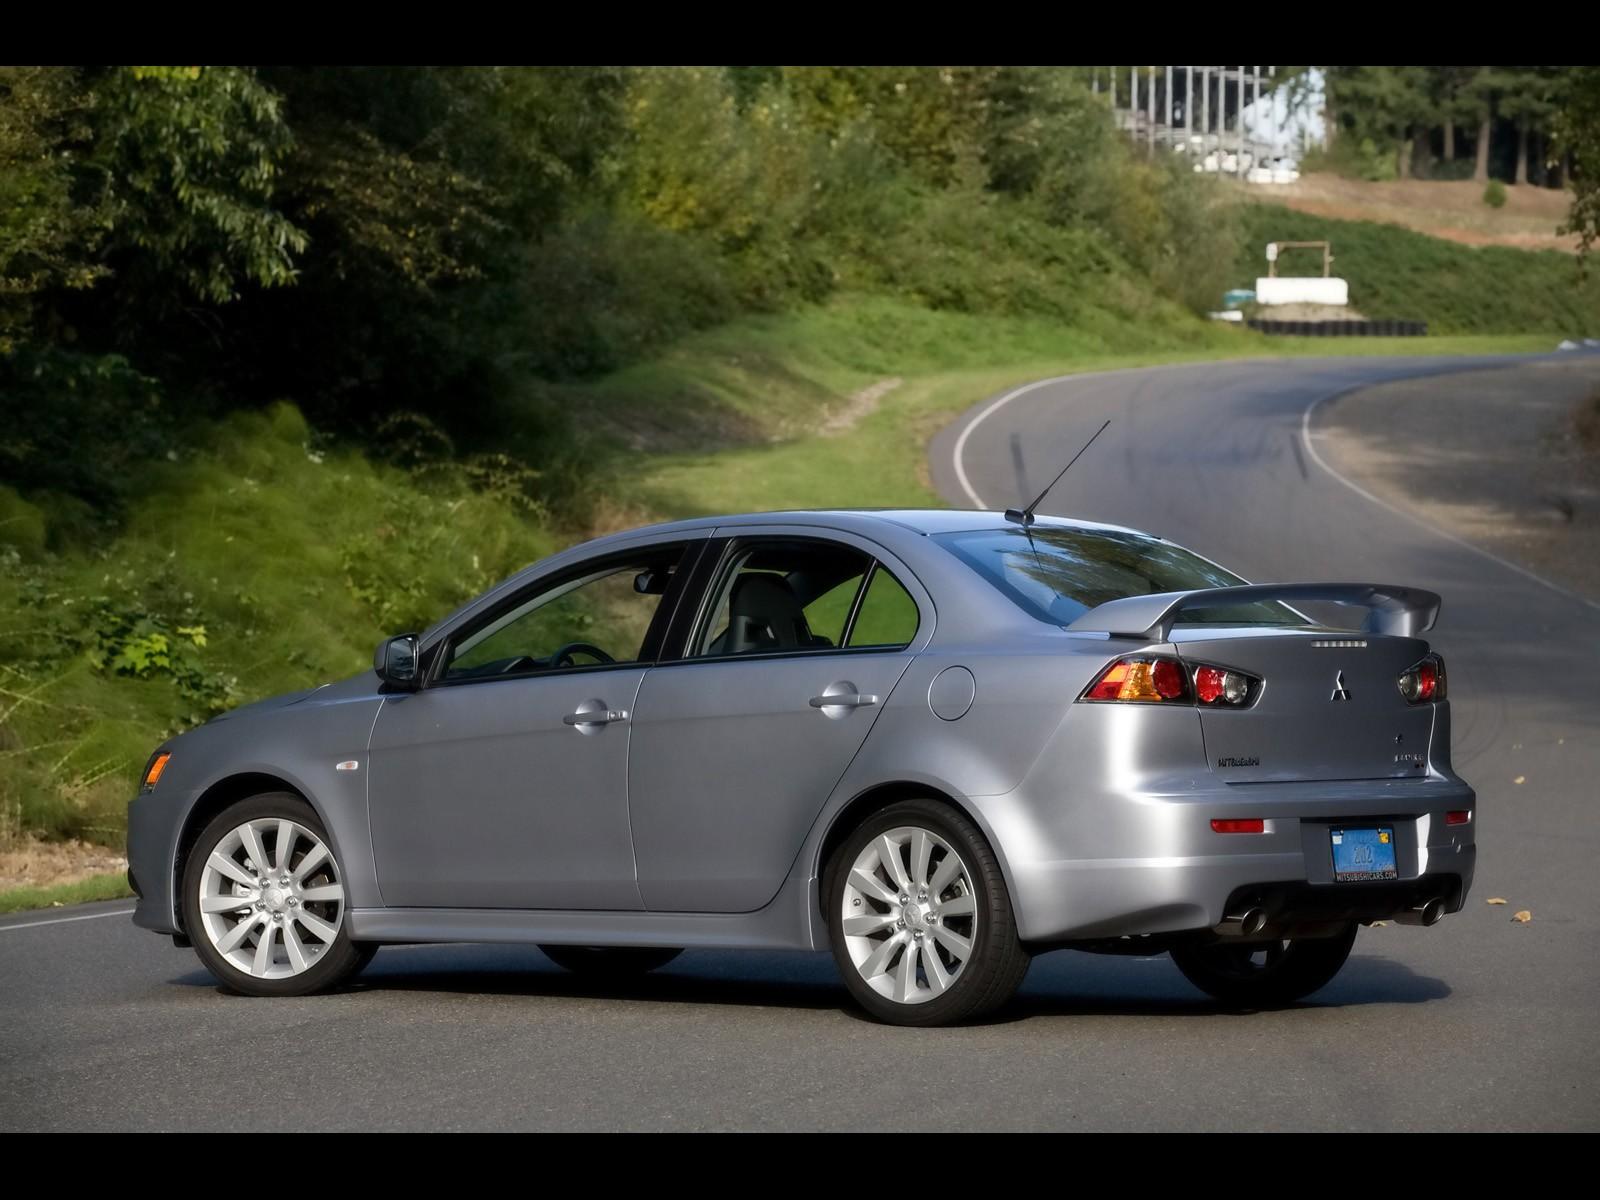 Mitsubishi Lancer Ralliart 2008 2009 2010 2011